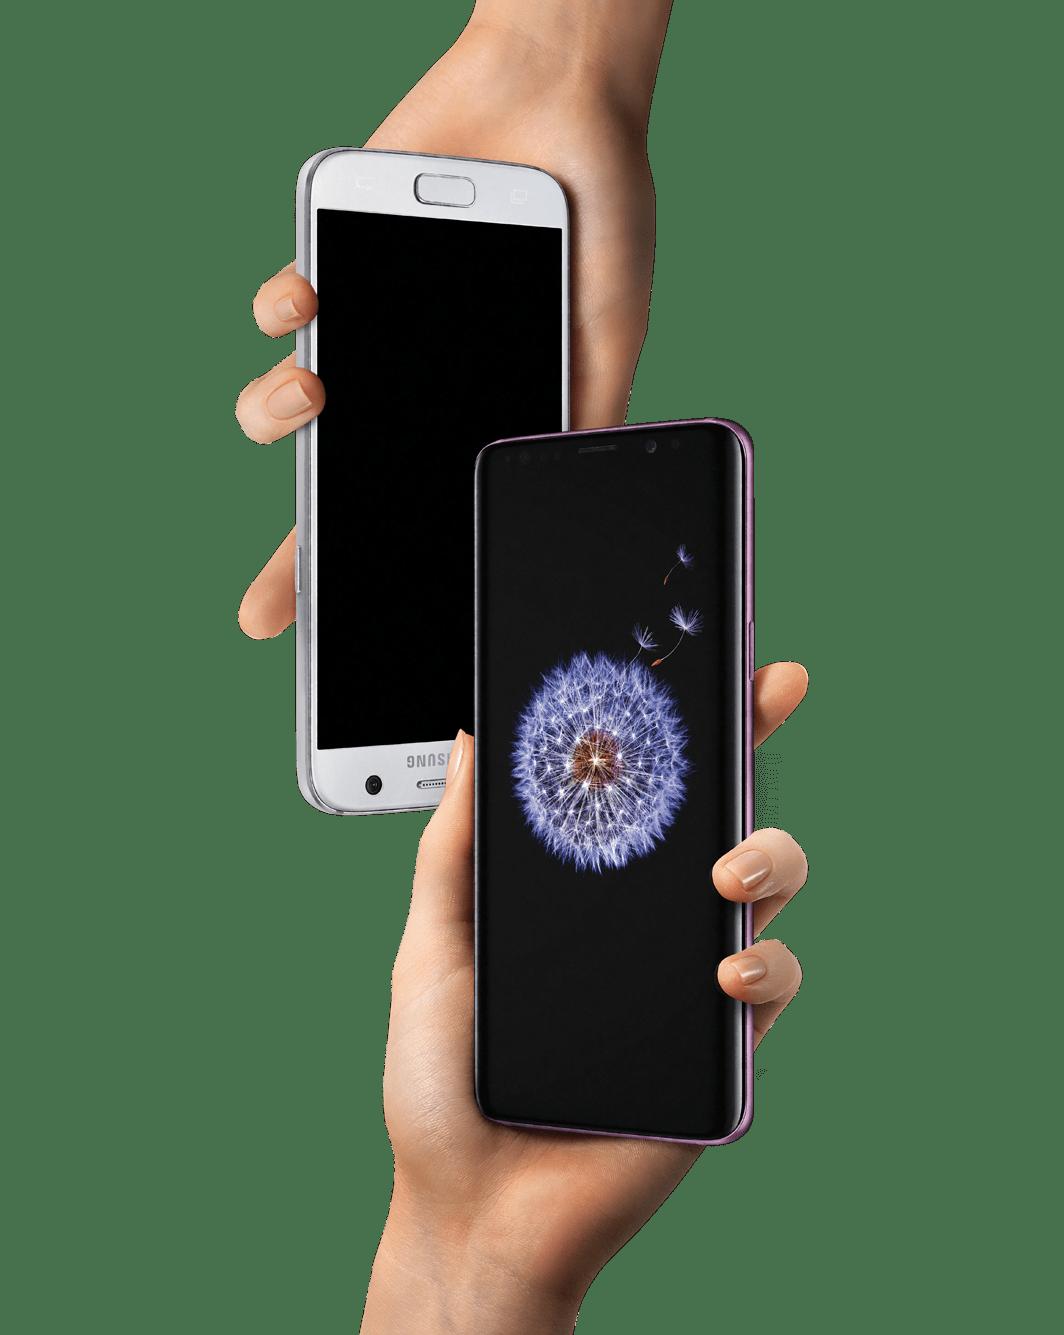 Samsung Galaxy Trade In